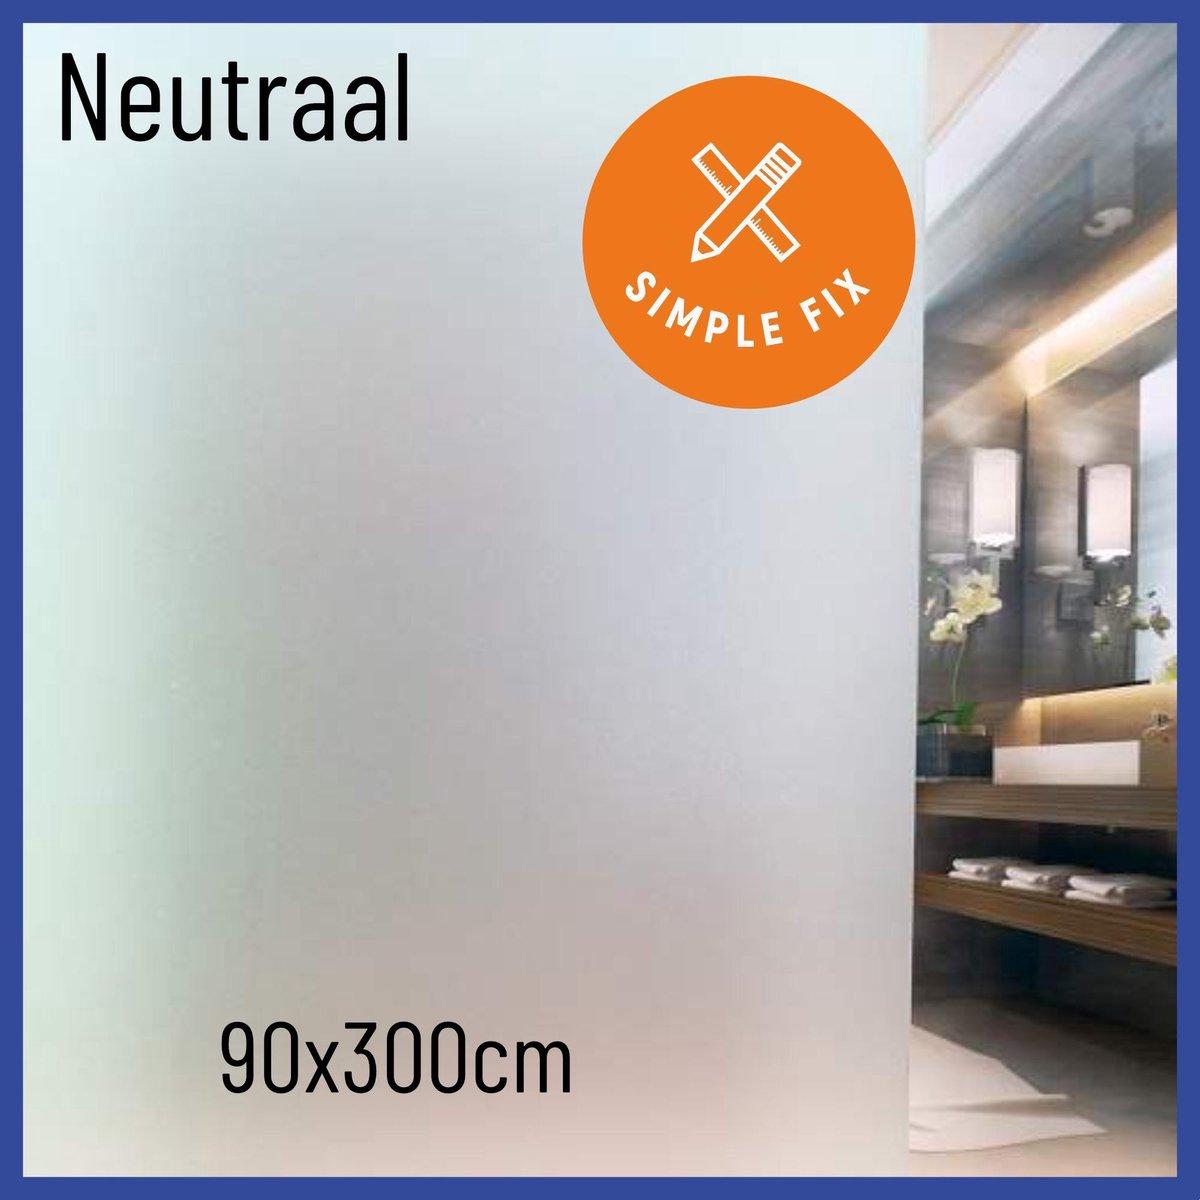 Raamfolie - 90cm x 300cm - Plakfolie - Zelfklevend - Statisch - Privacy Verhogend - Anti Inkijk